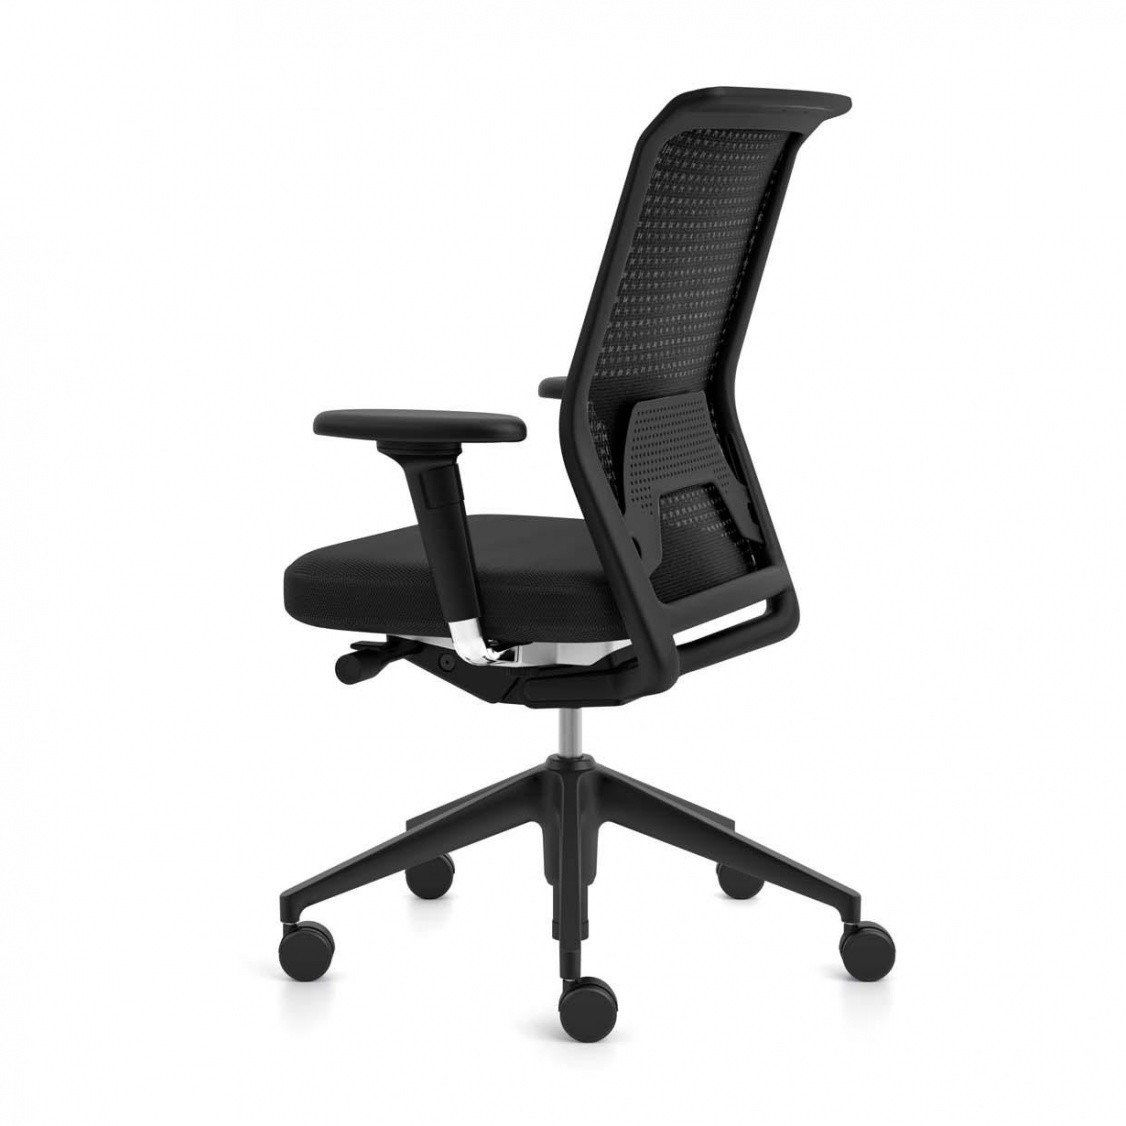 vitra id mesh chaise de bureau pivotante ambientedirect. Black Bedroom Furniture Sets. Home Design Ideas